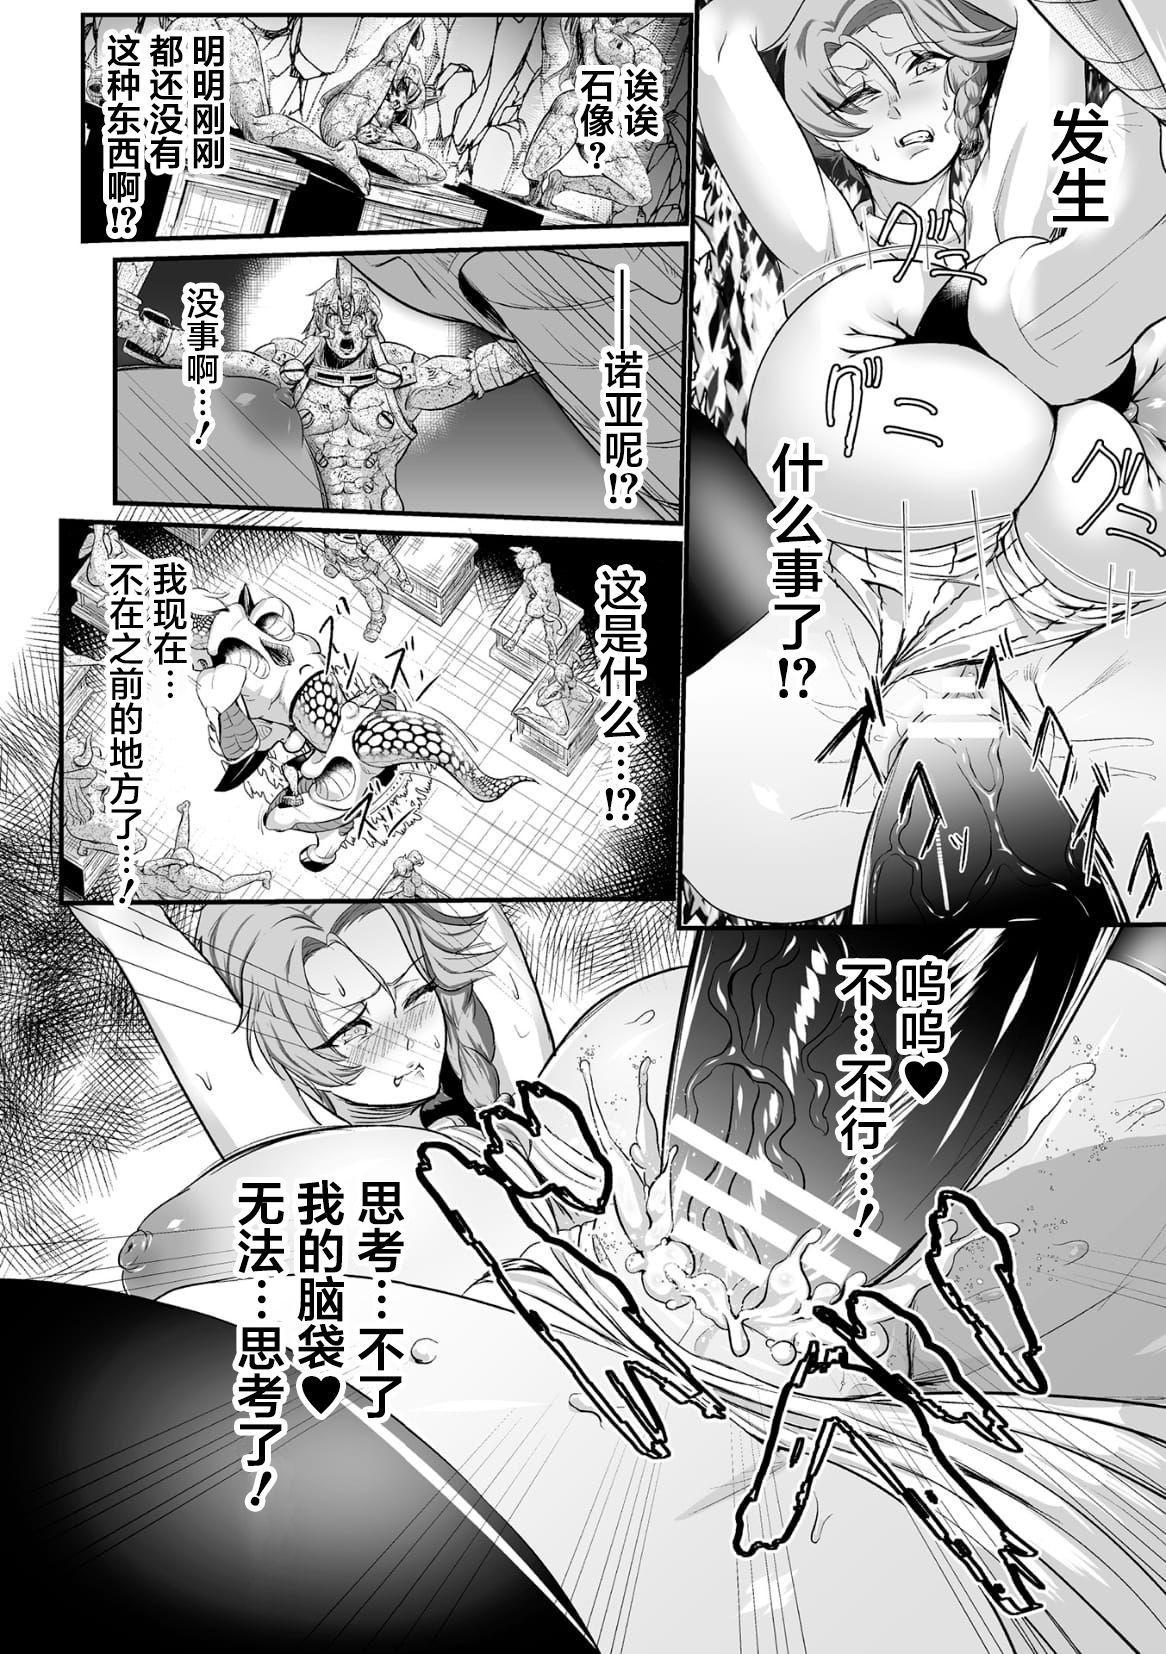 [Mou] Sekkan Fuuin ~Enbi na Sekizou ni Otosareshi Yuusha Ichizoku~ Ch. 1 [Chinese] [不咕鸟汉化组] 11